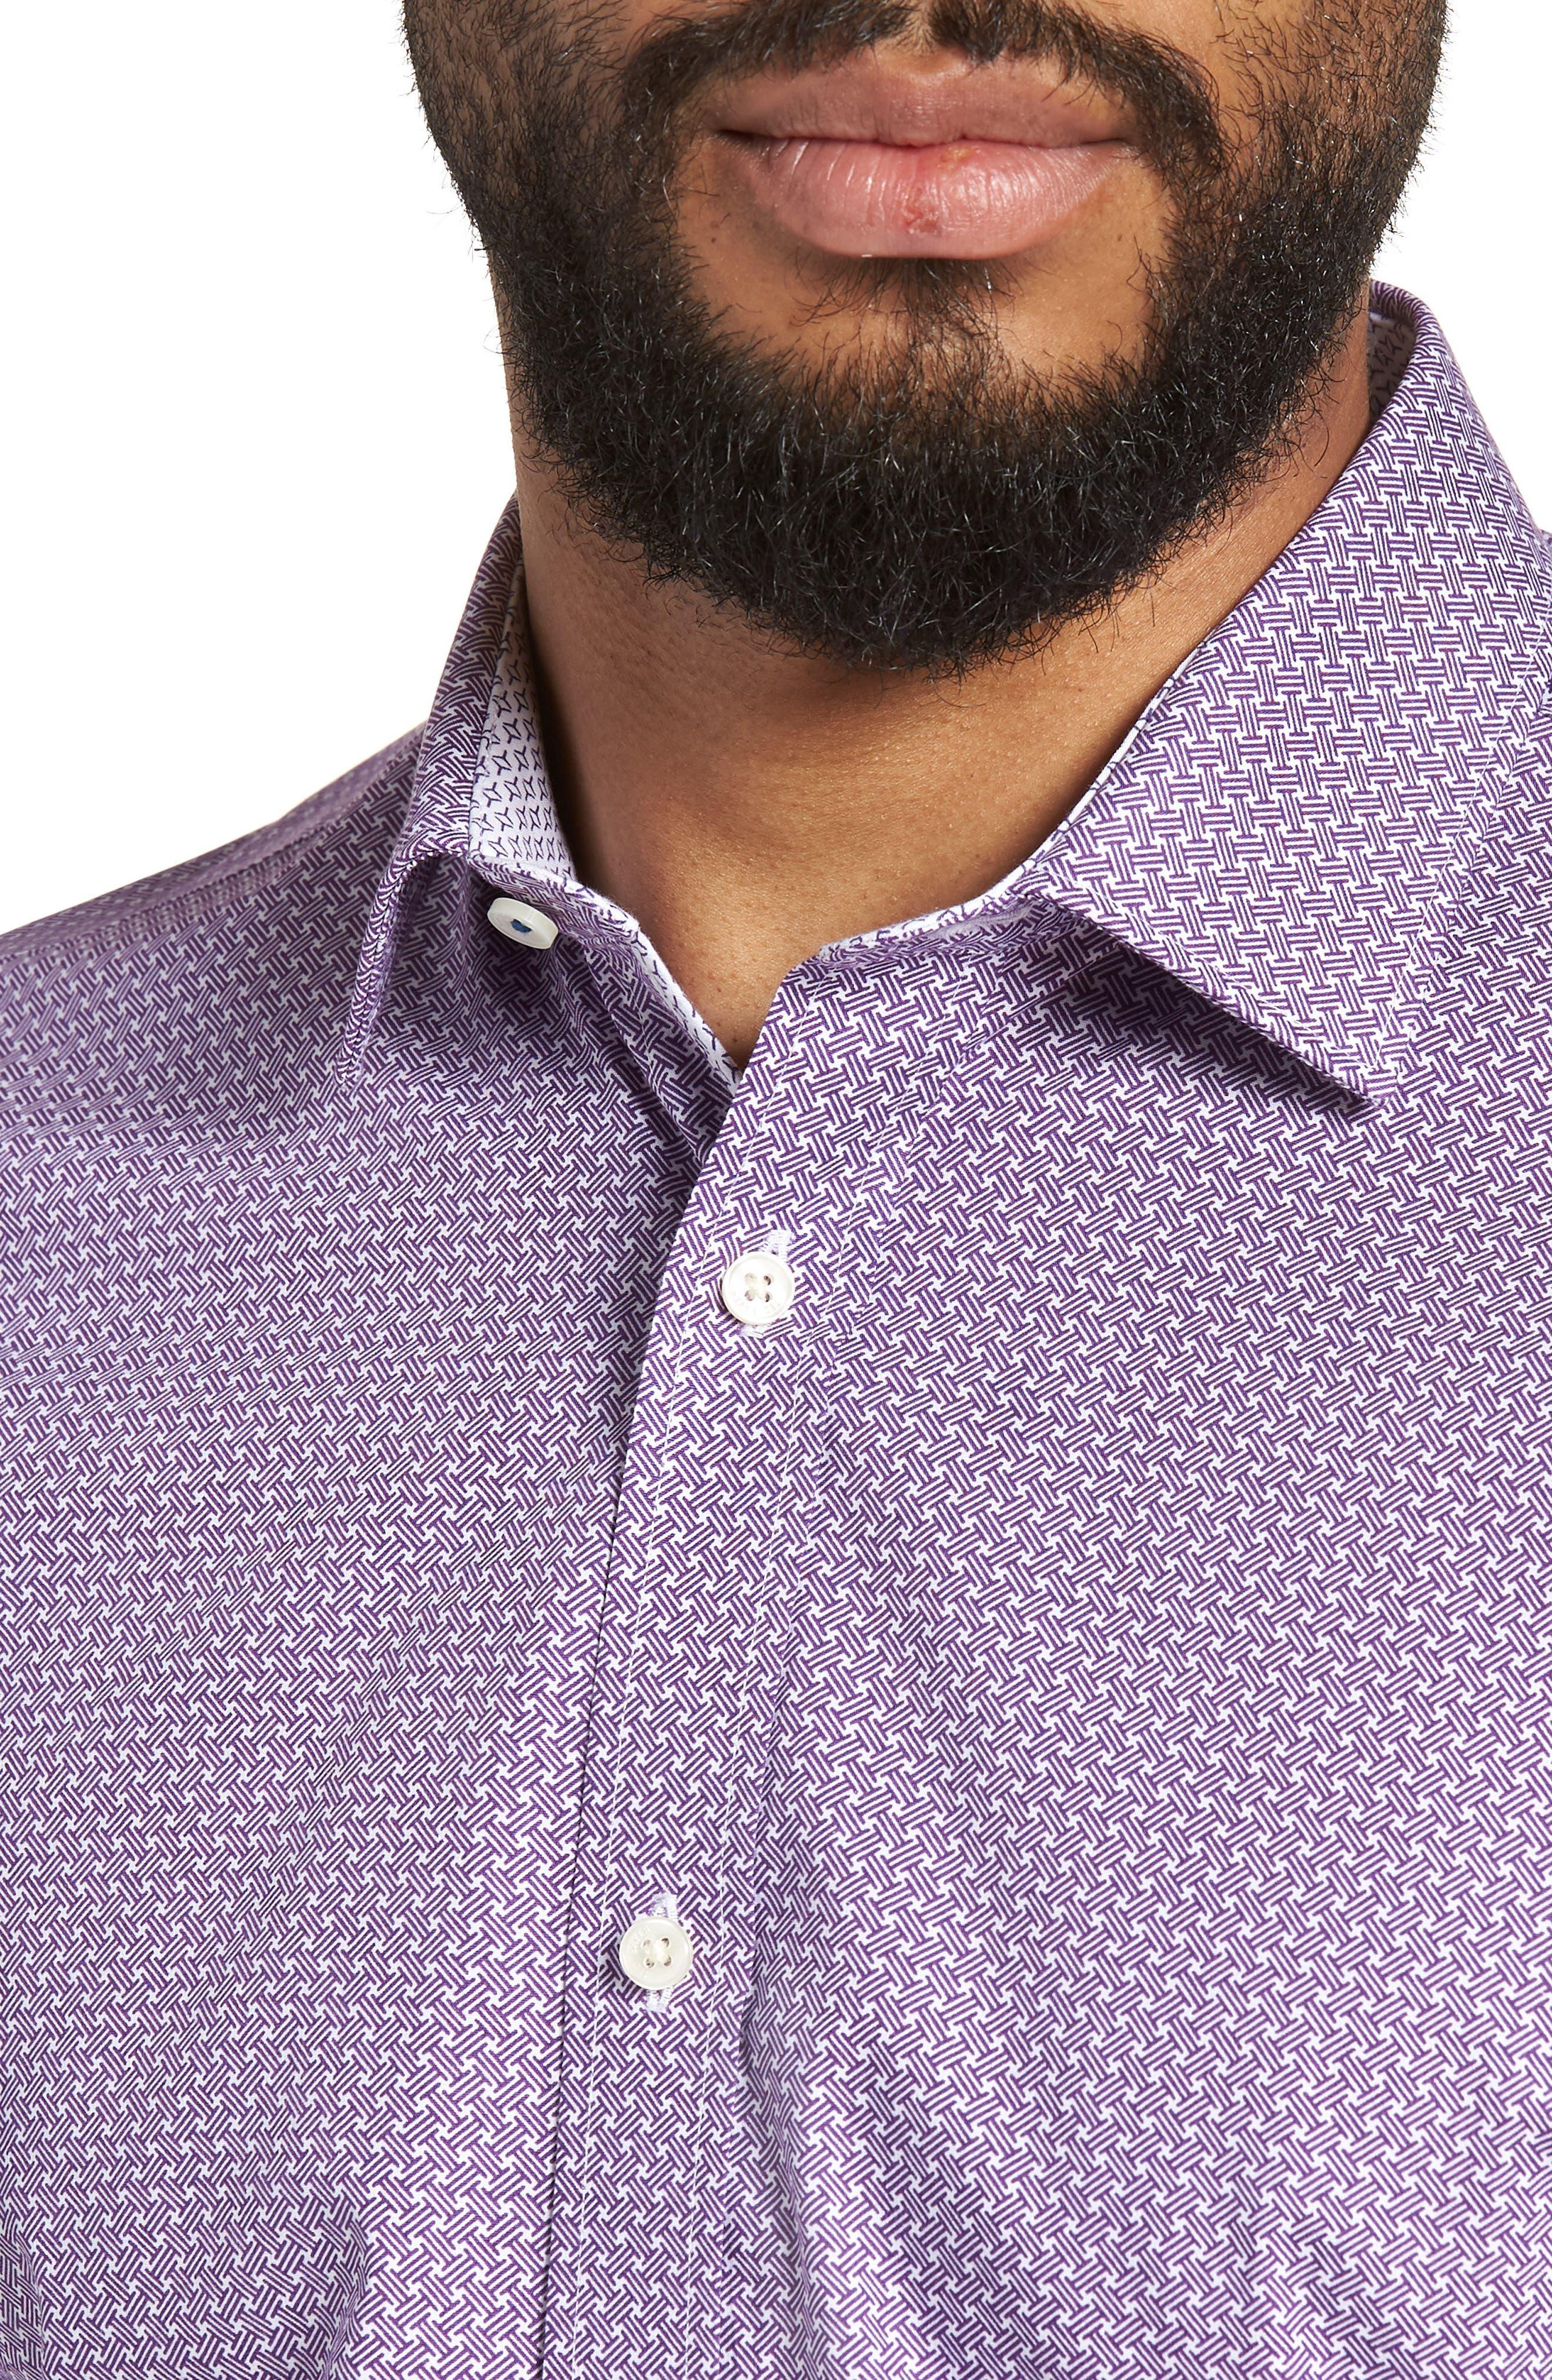 Rugber Slim Fit Print Dress Shirt,                             Alternate thumbnail 2, color,                             PURPLE